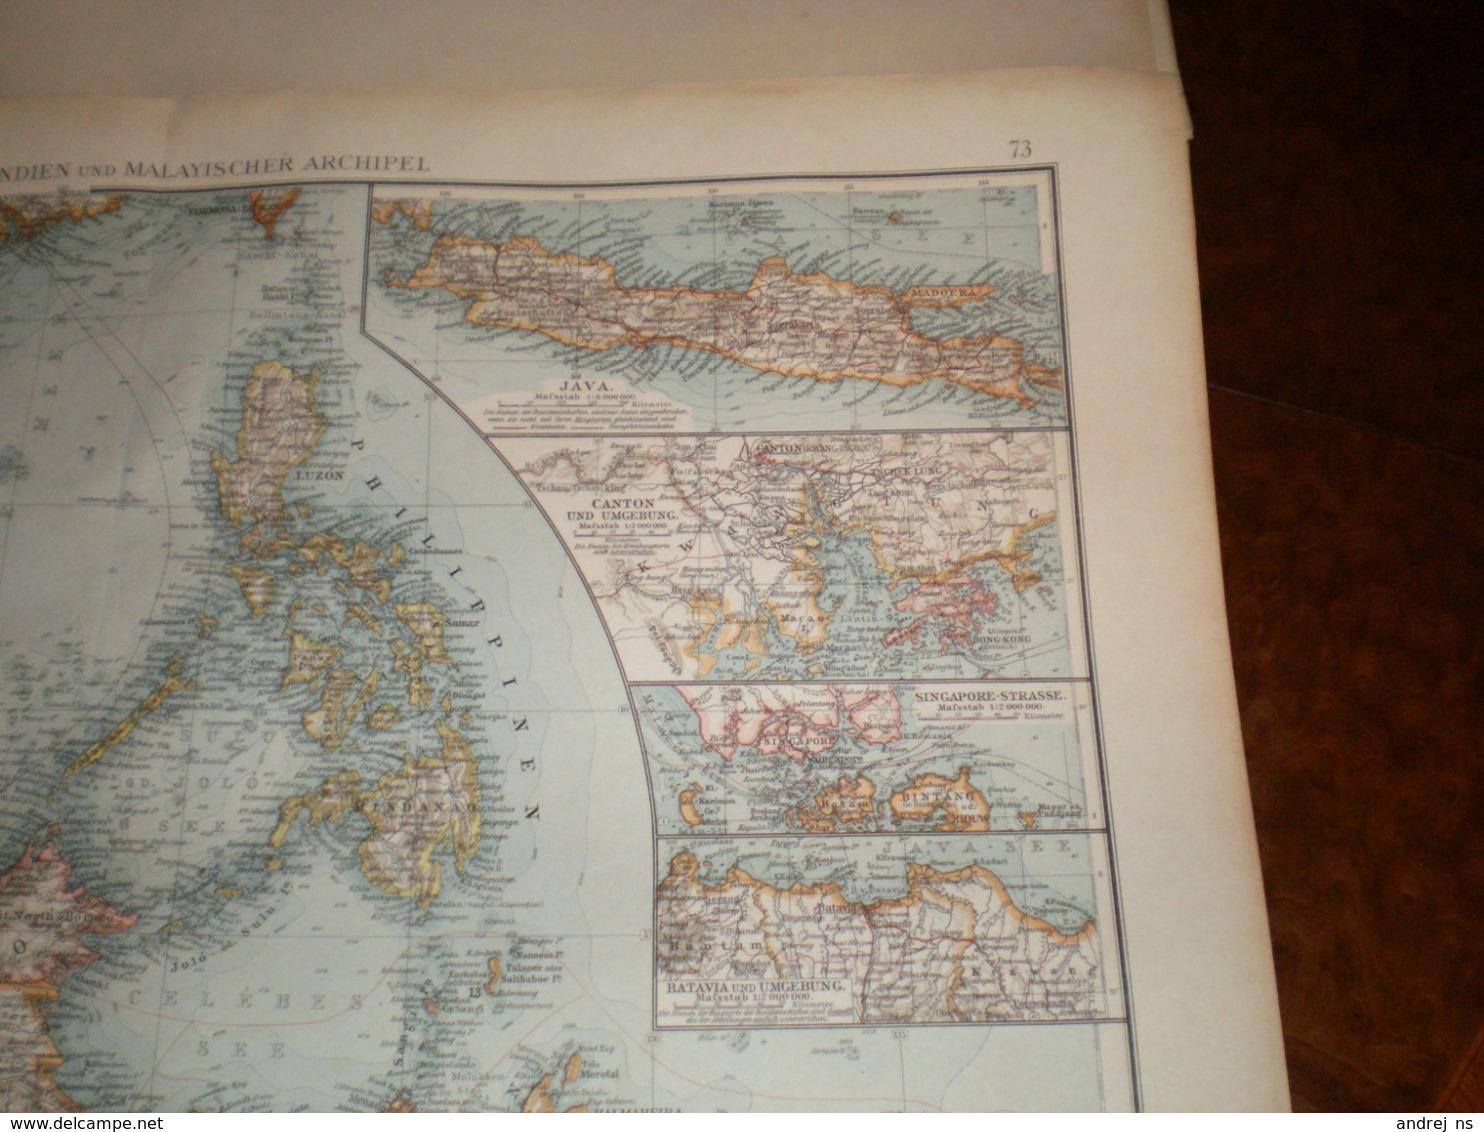 Hinterindien Und Malayischer Archipe; Volks Und Familien Atlas A Shobel Leipzig 1901 Big Map - Cartes Géographiques